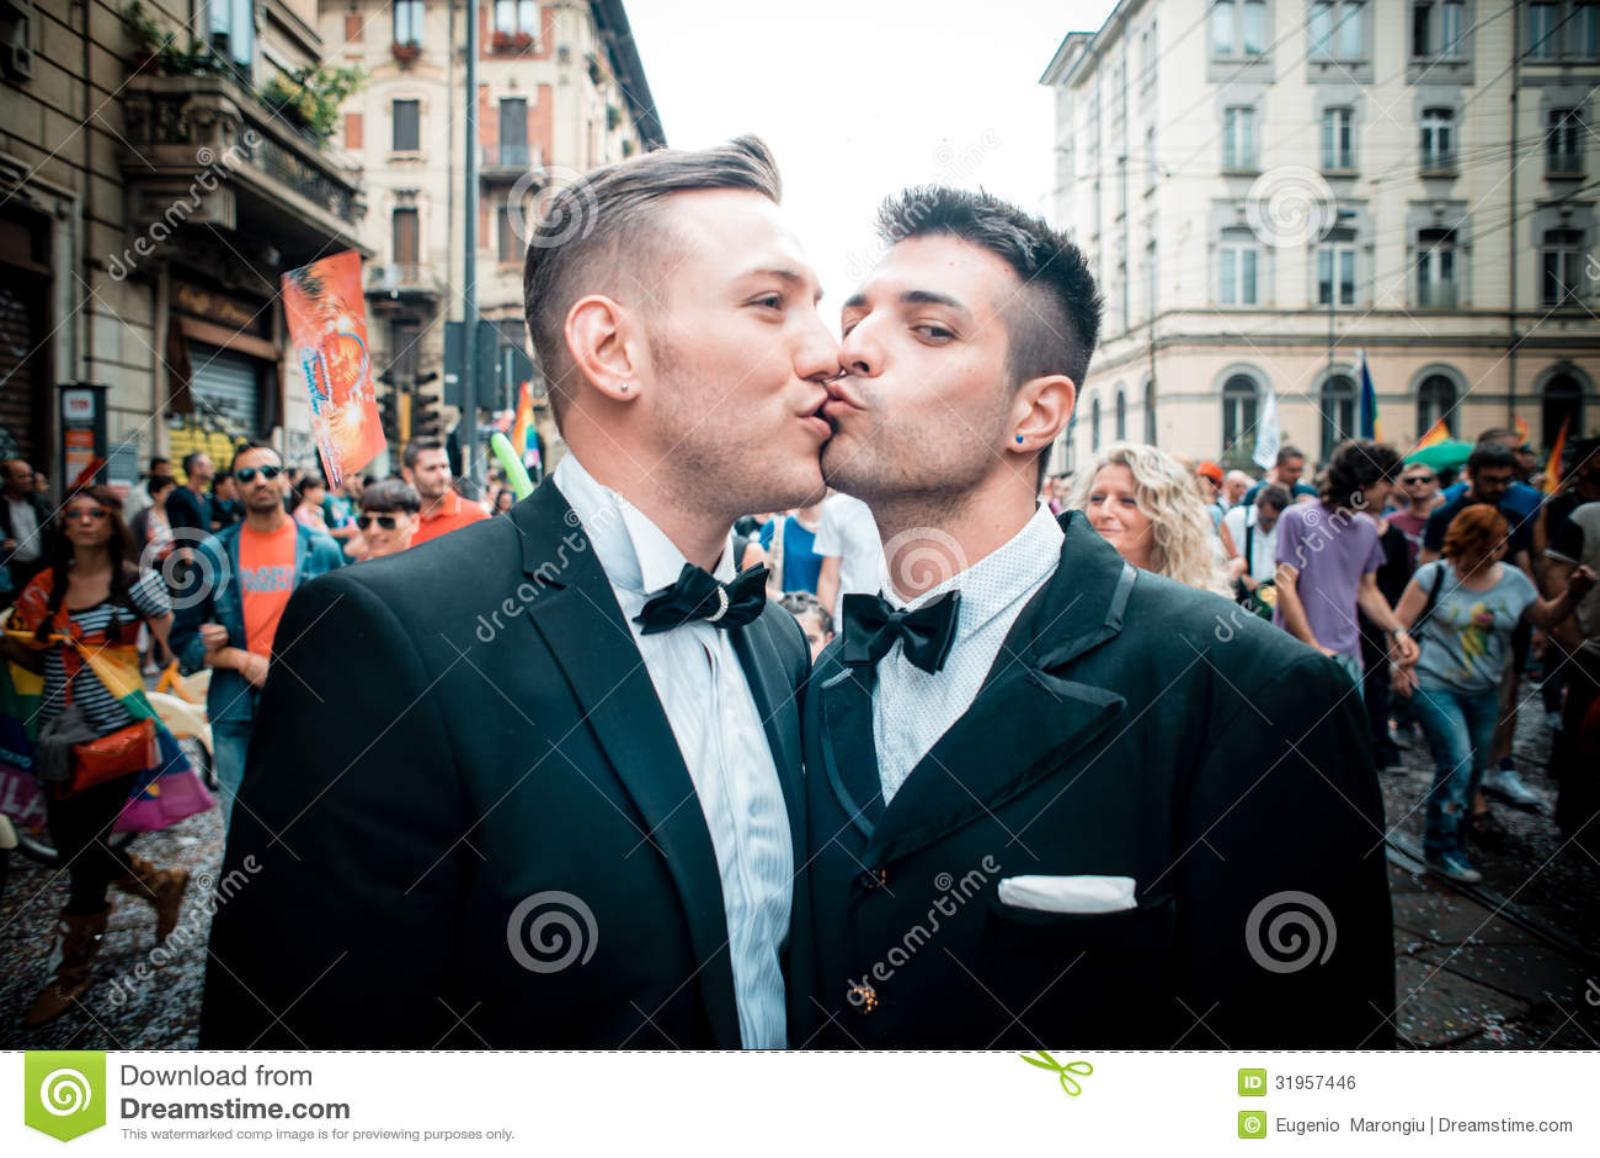 Schwulenparade in Mailand im Juni, 29 2013